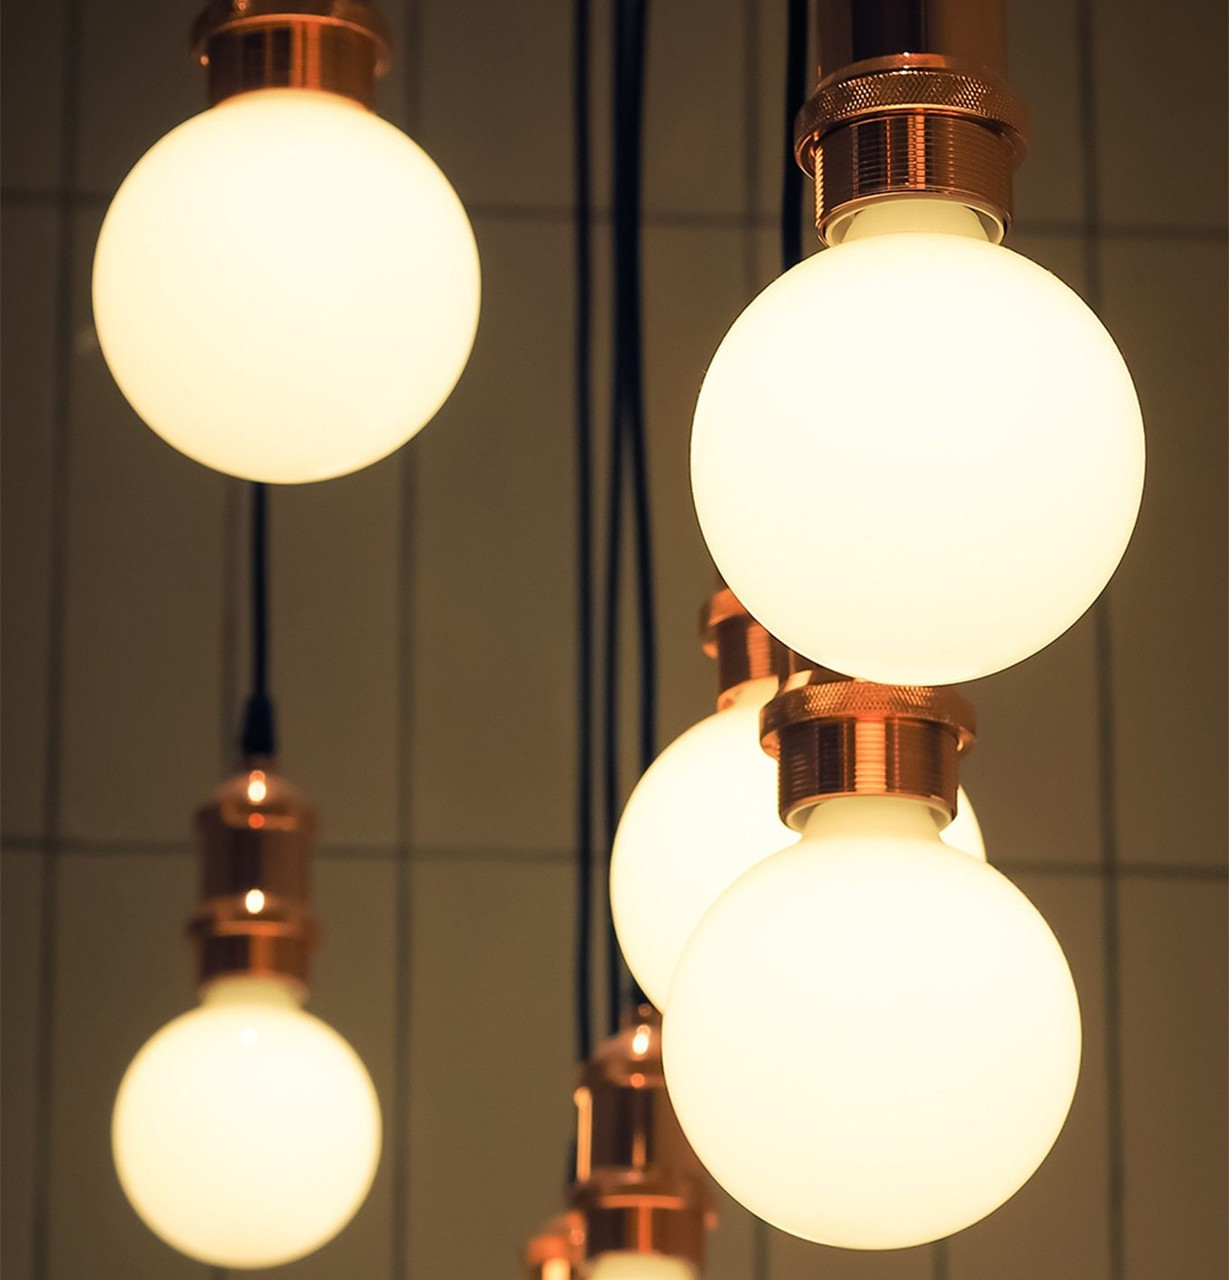 LED Dimmable Globe Spiral Filament Light Bulbs